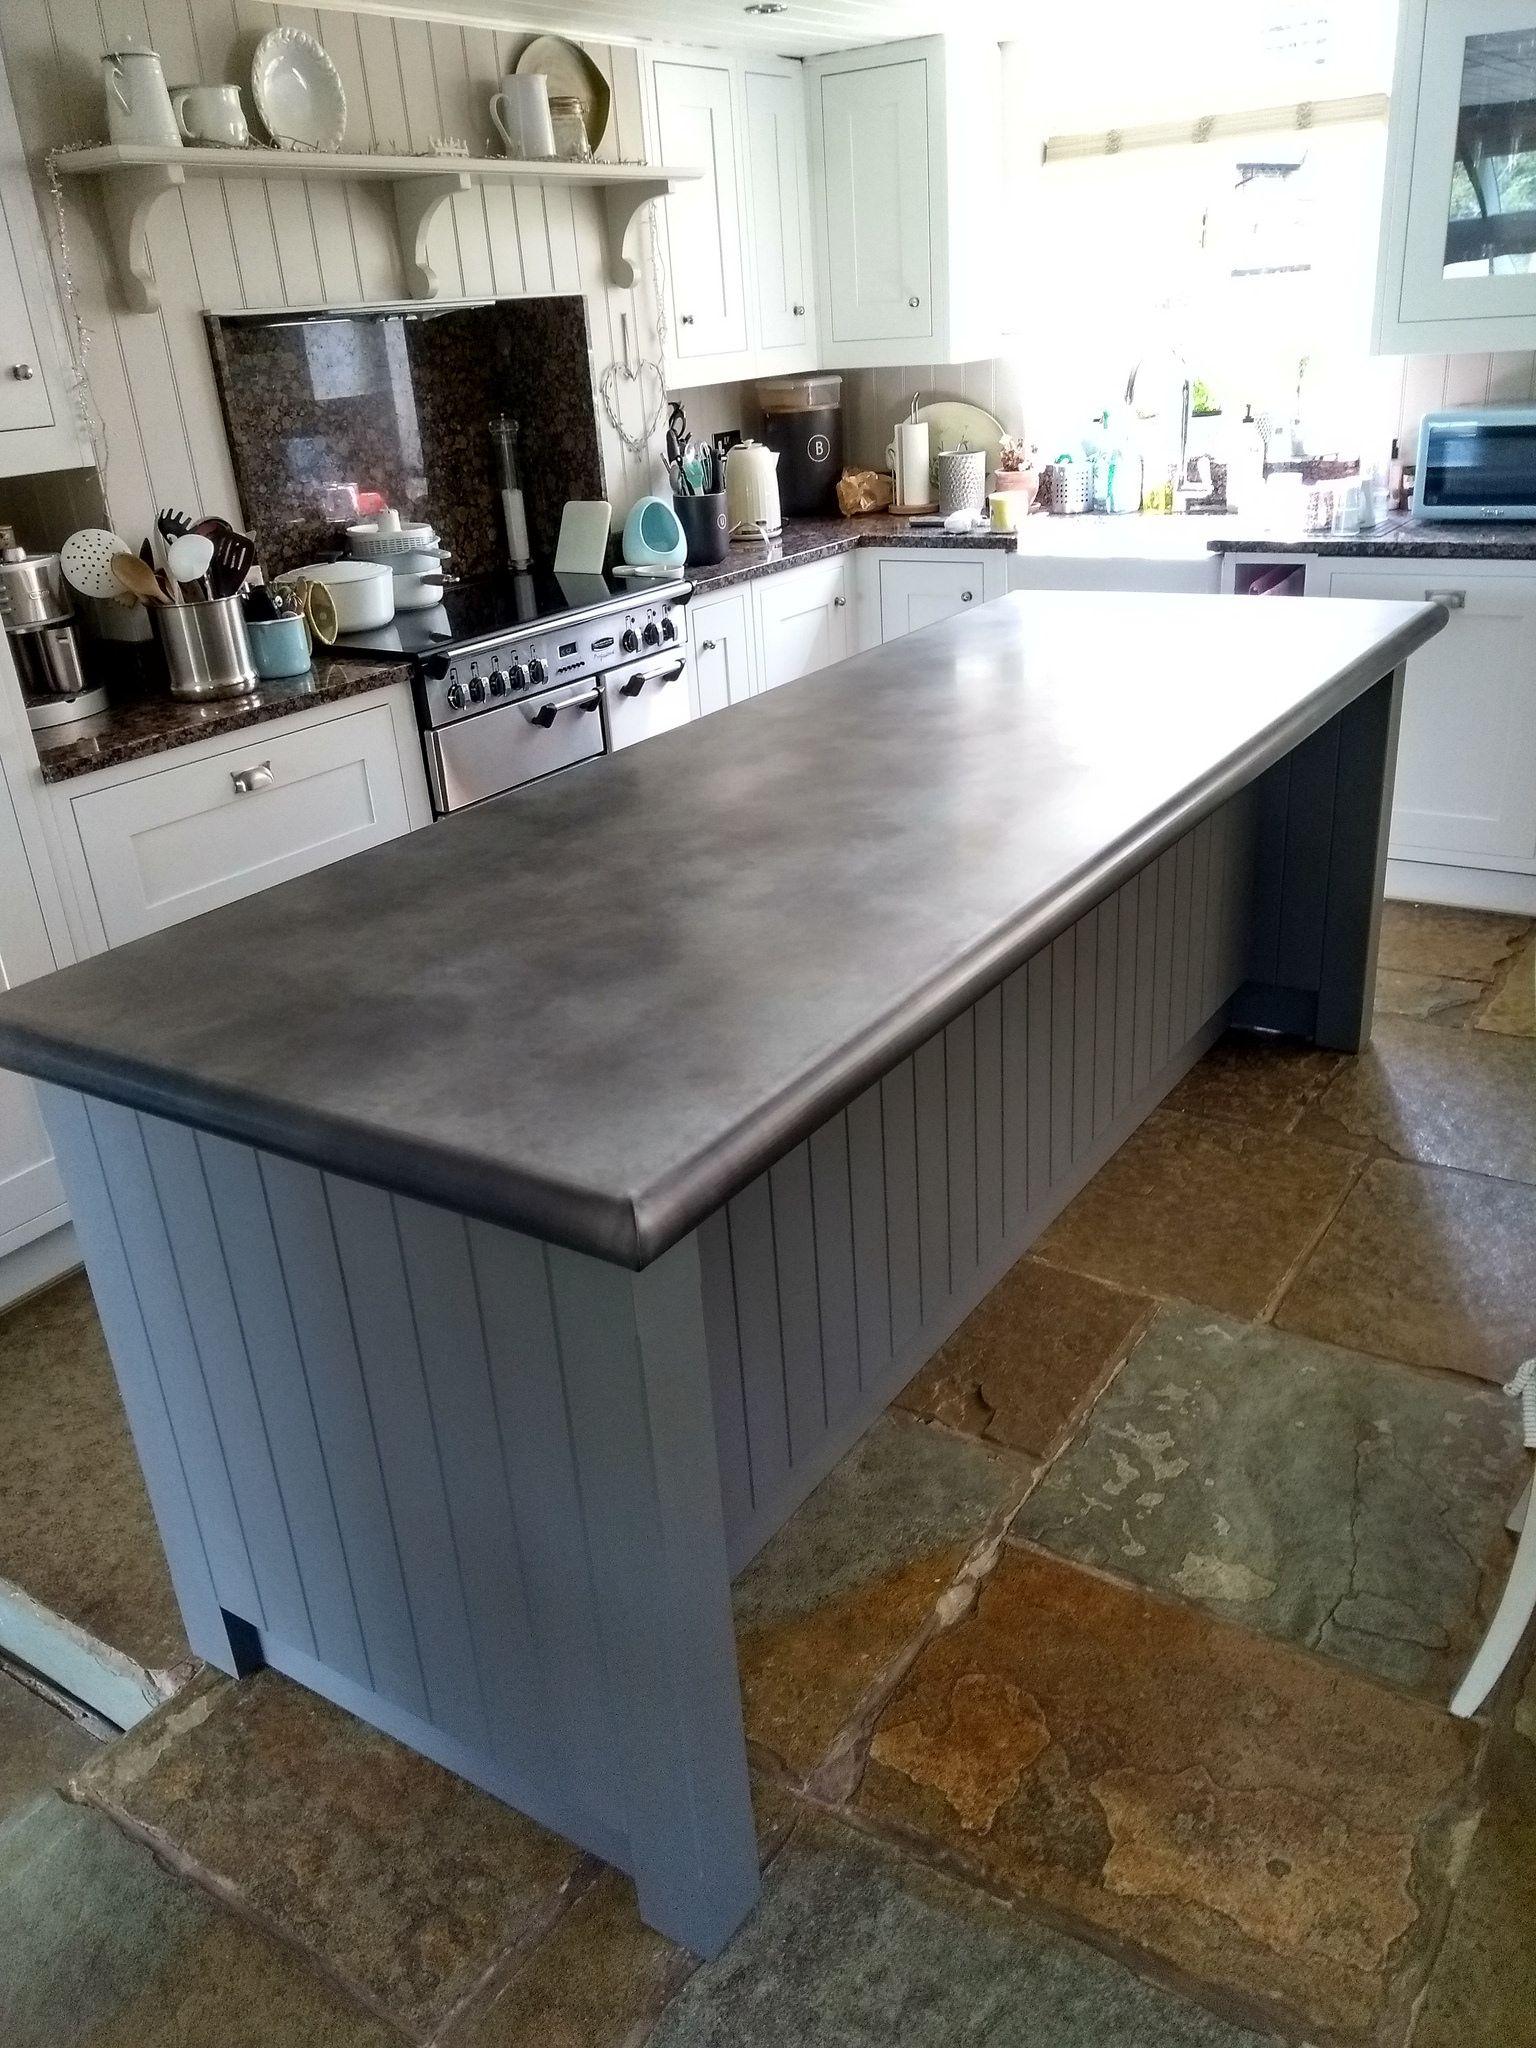 202 aged zinc worktop in 2020 kitchen dining living kitchen design cool kitchens on kitchen zinc id=22491